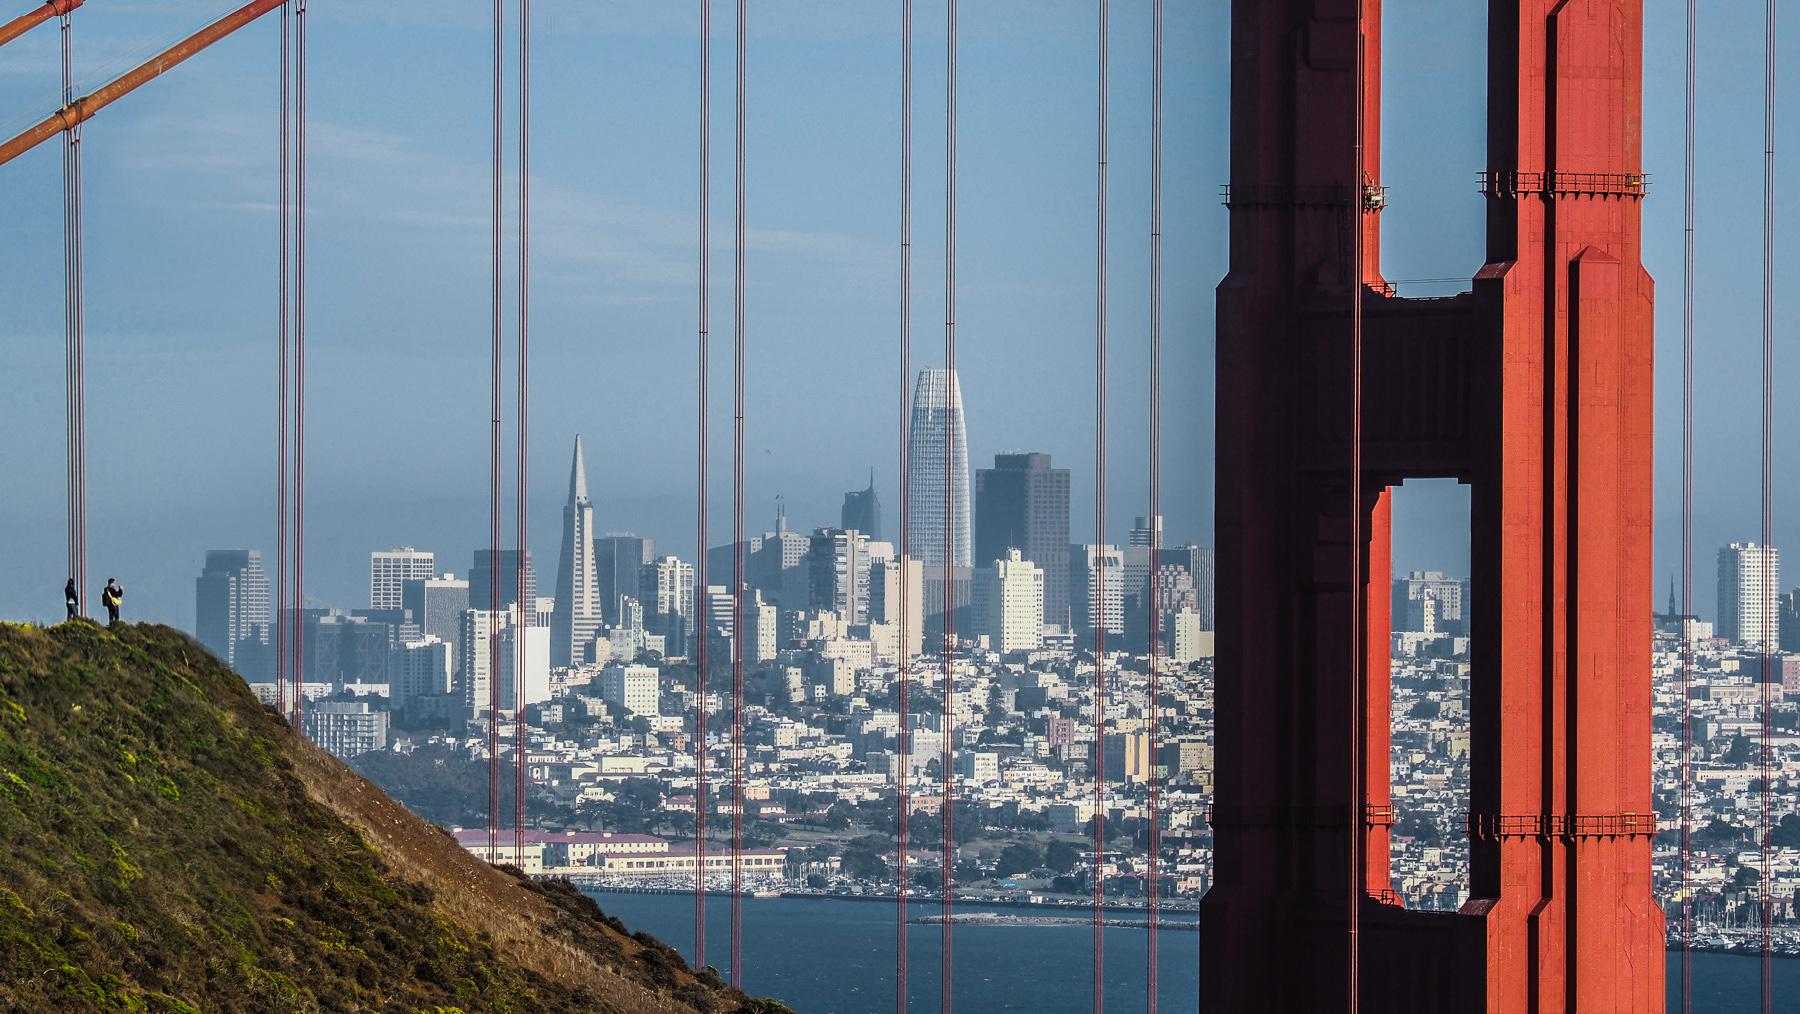 Golden Gate Bridge, der beste Ausblick